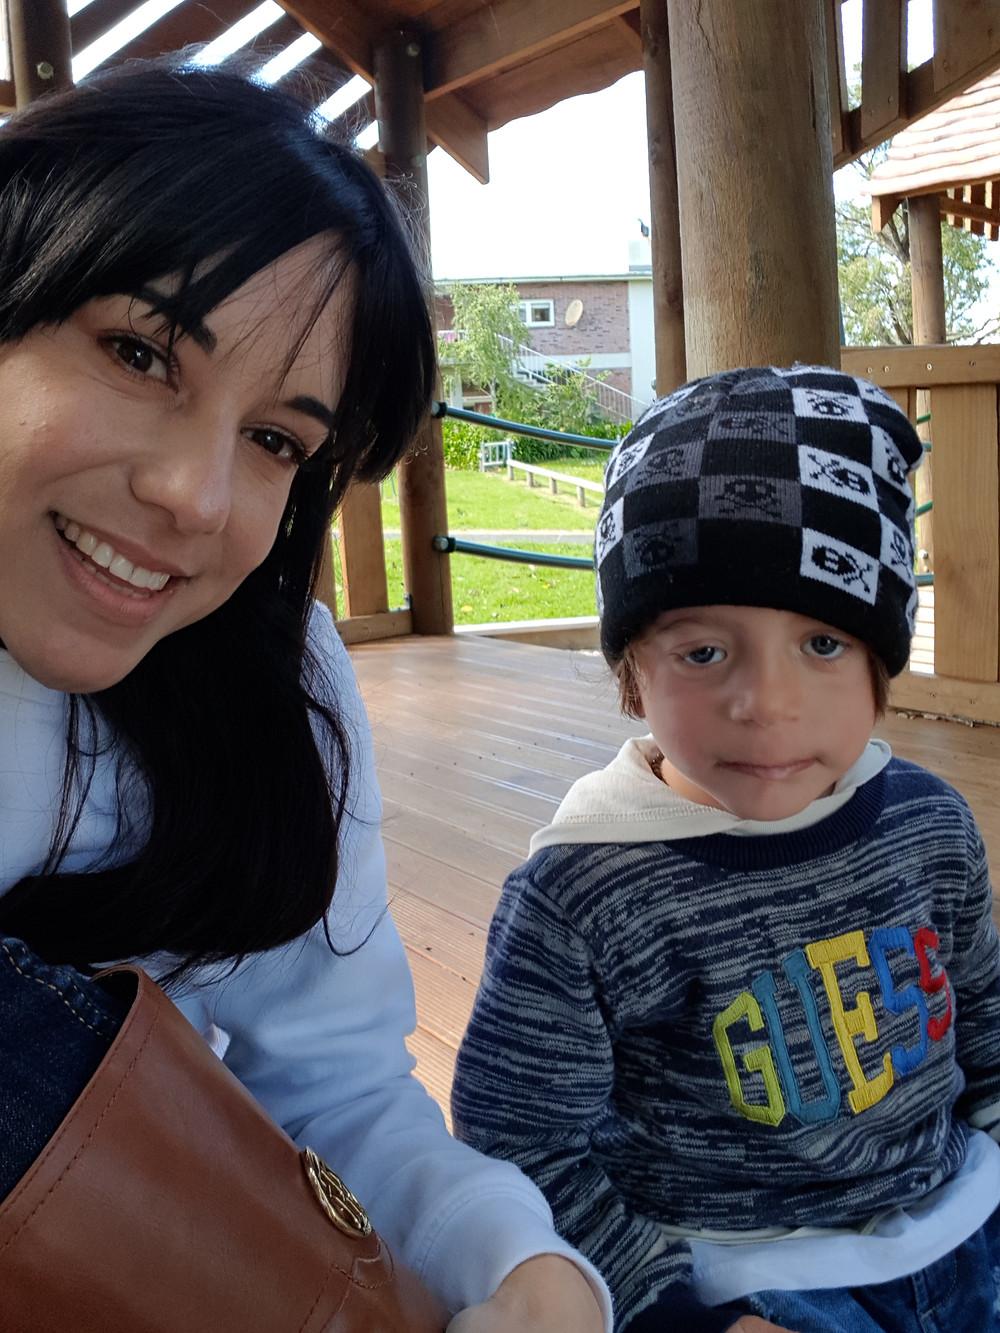 Katy Thomas Blogger Medicinal Cannabis Medical Marijuana Epilepsy CBD THC Edward Playground Auckland